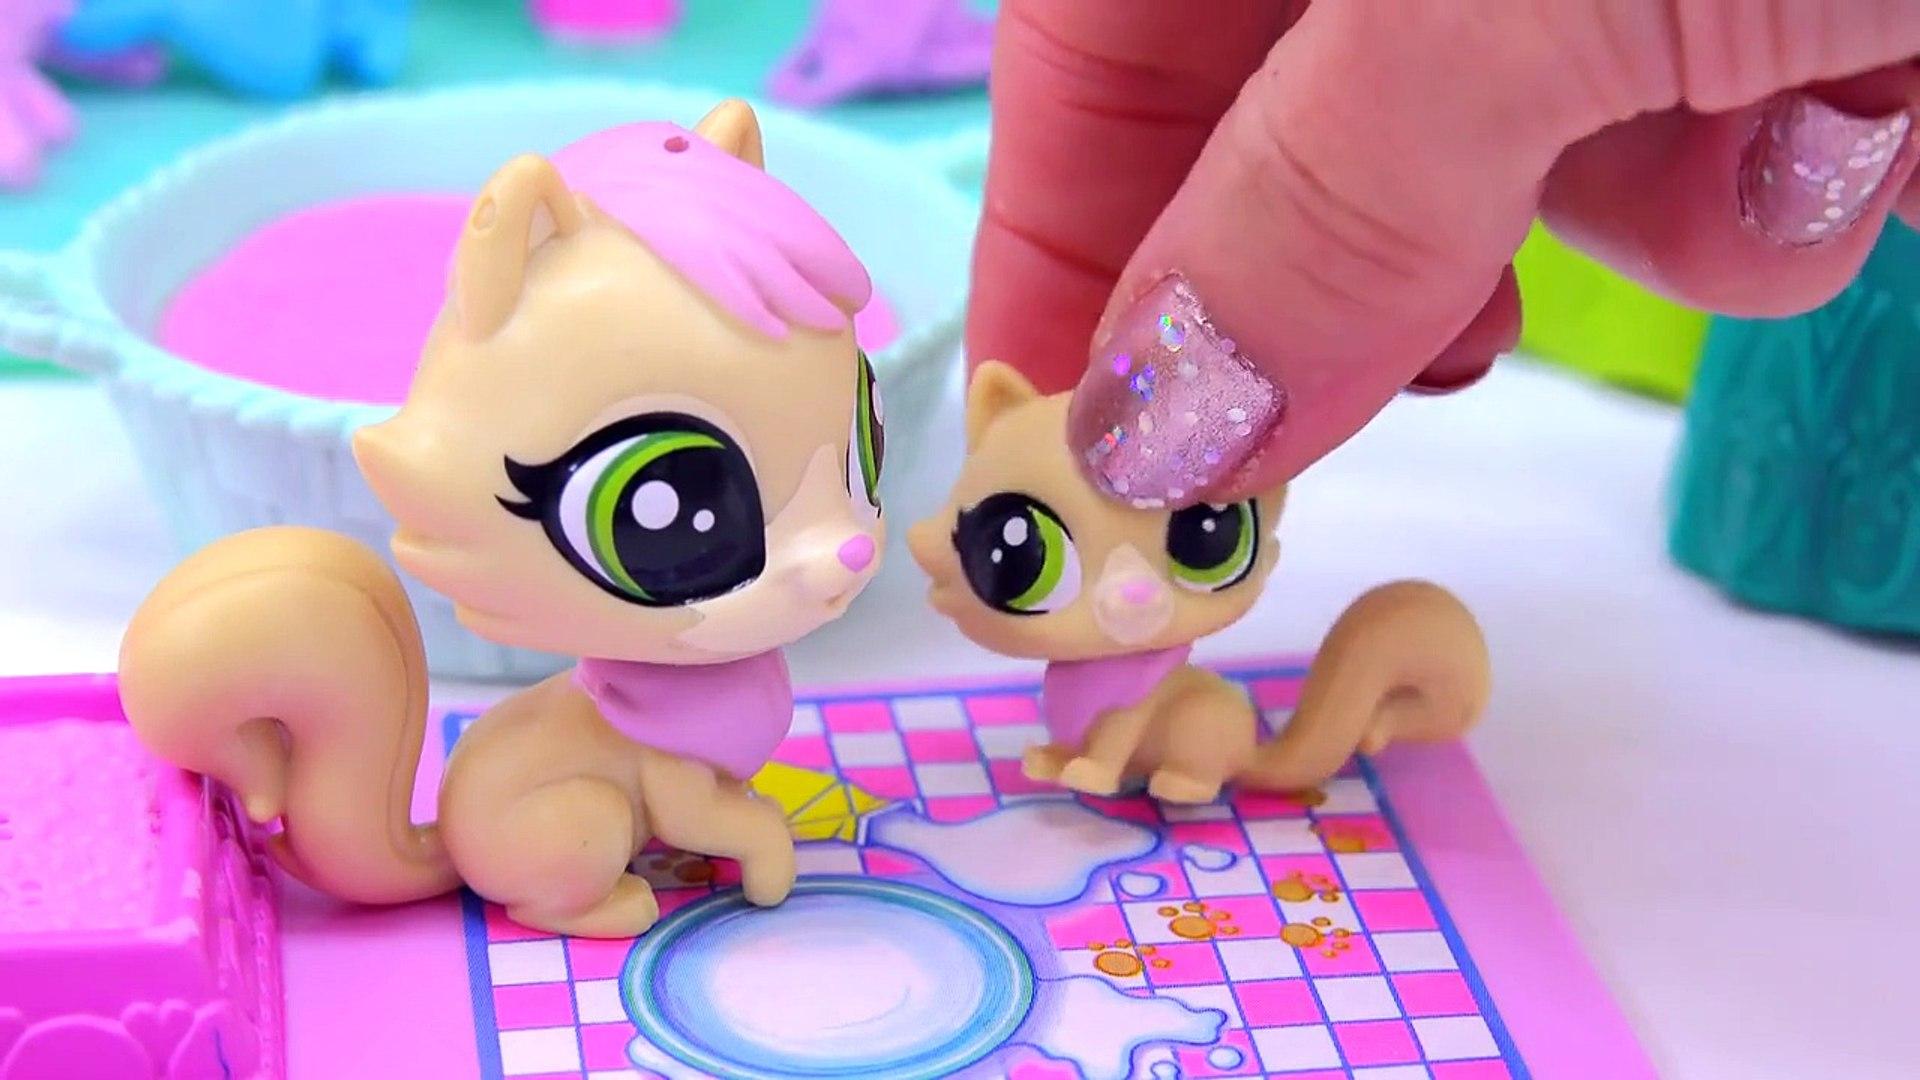 Littlest Pet Shop Kitty Cat Mom and Kitten Babies Surprise Families Playset - Cookieswirlc